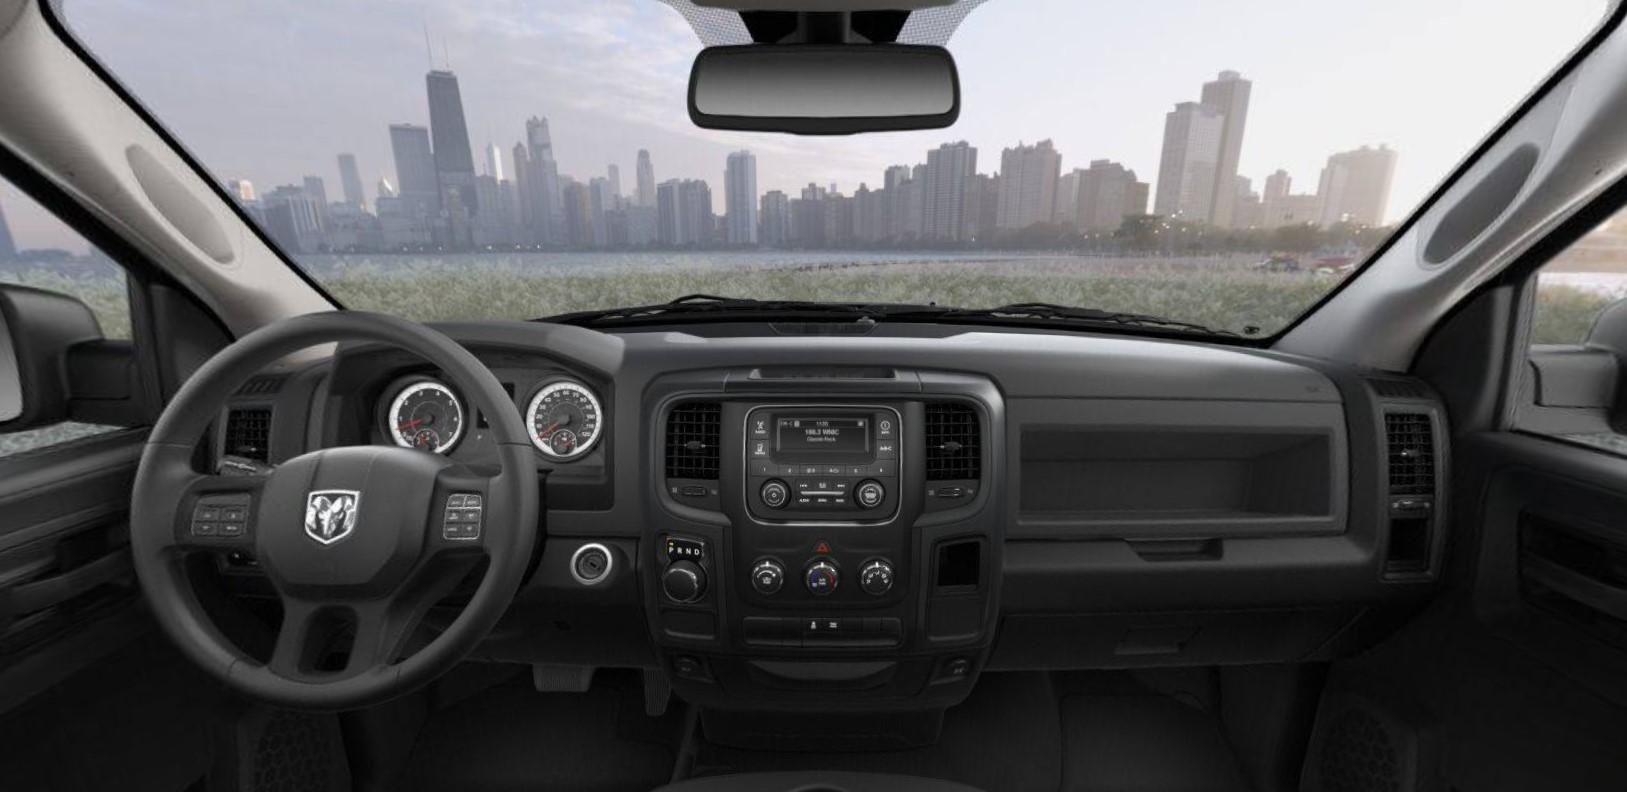 2019 Ram 1500 Express Front Dashboard Interior